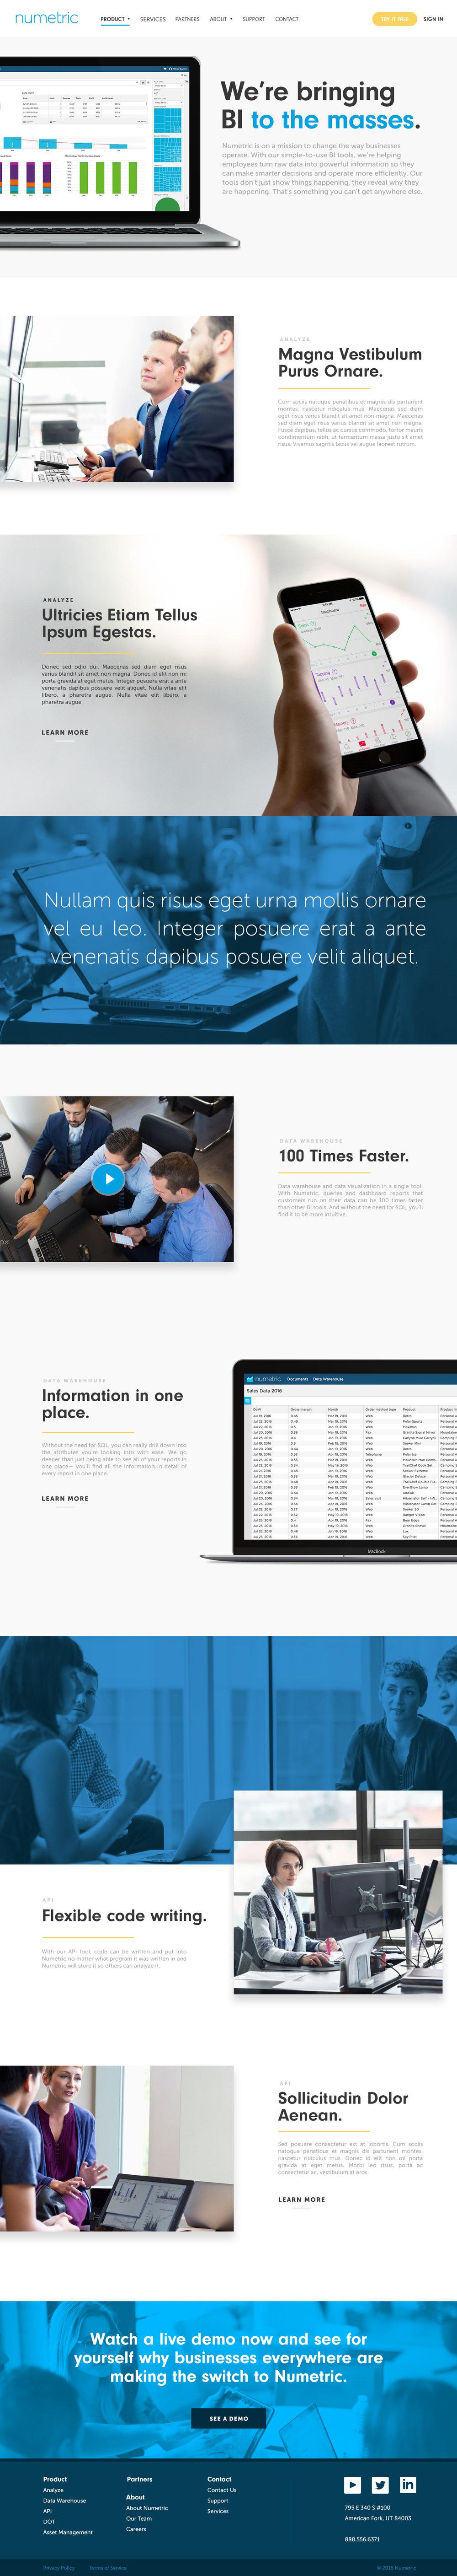 Numetric_Design_Page_2.jpg